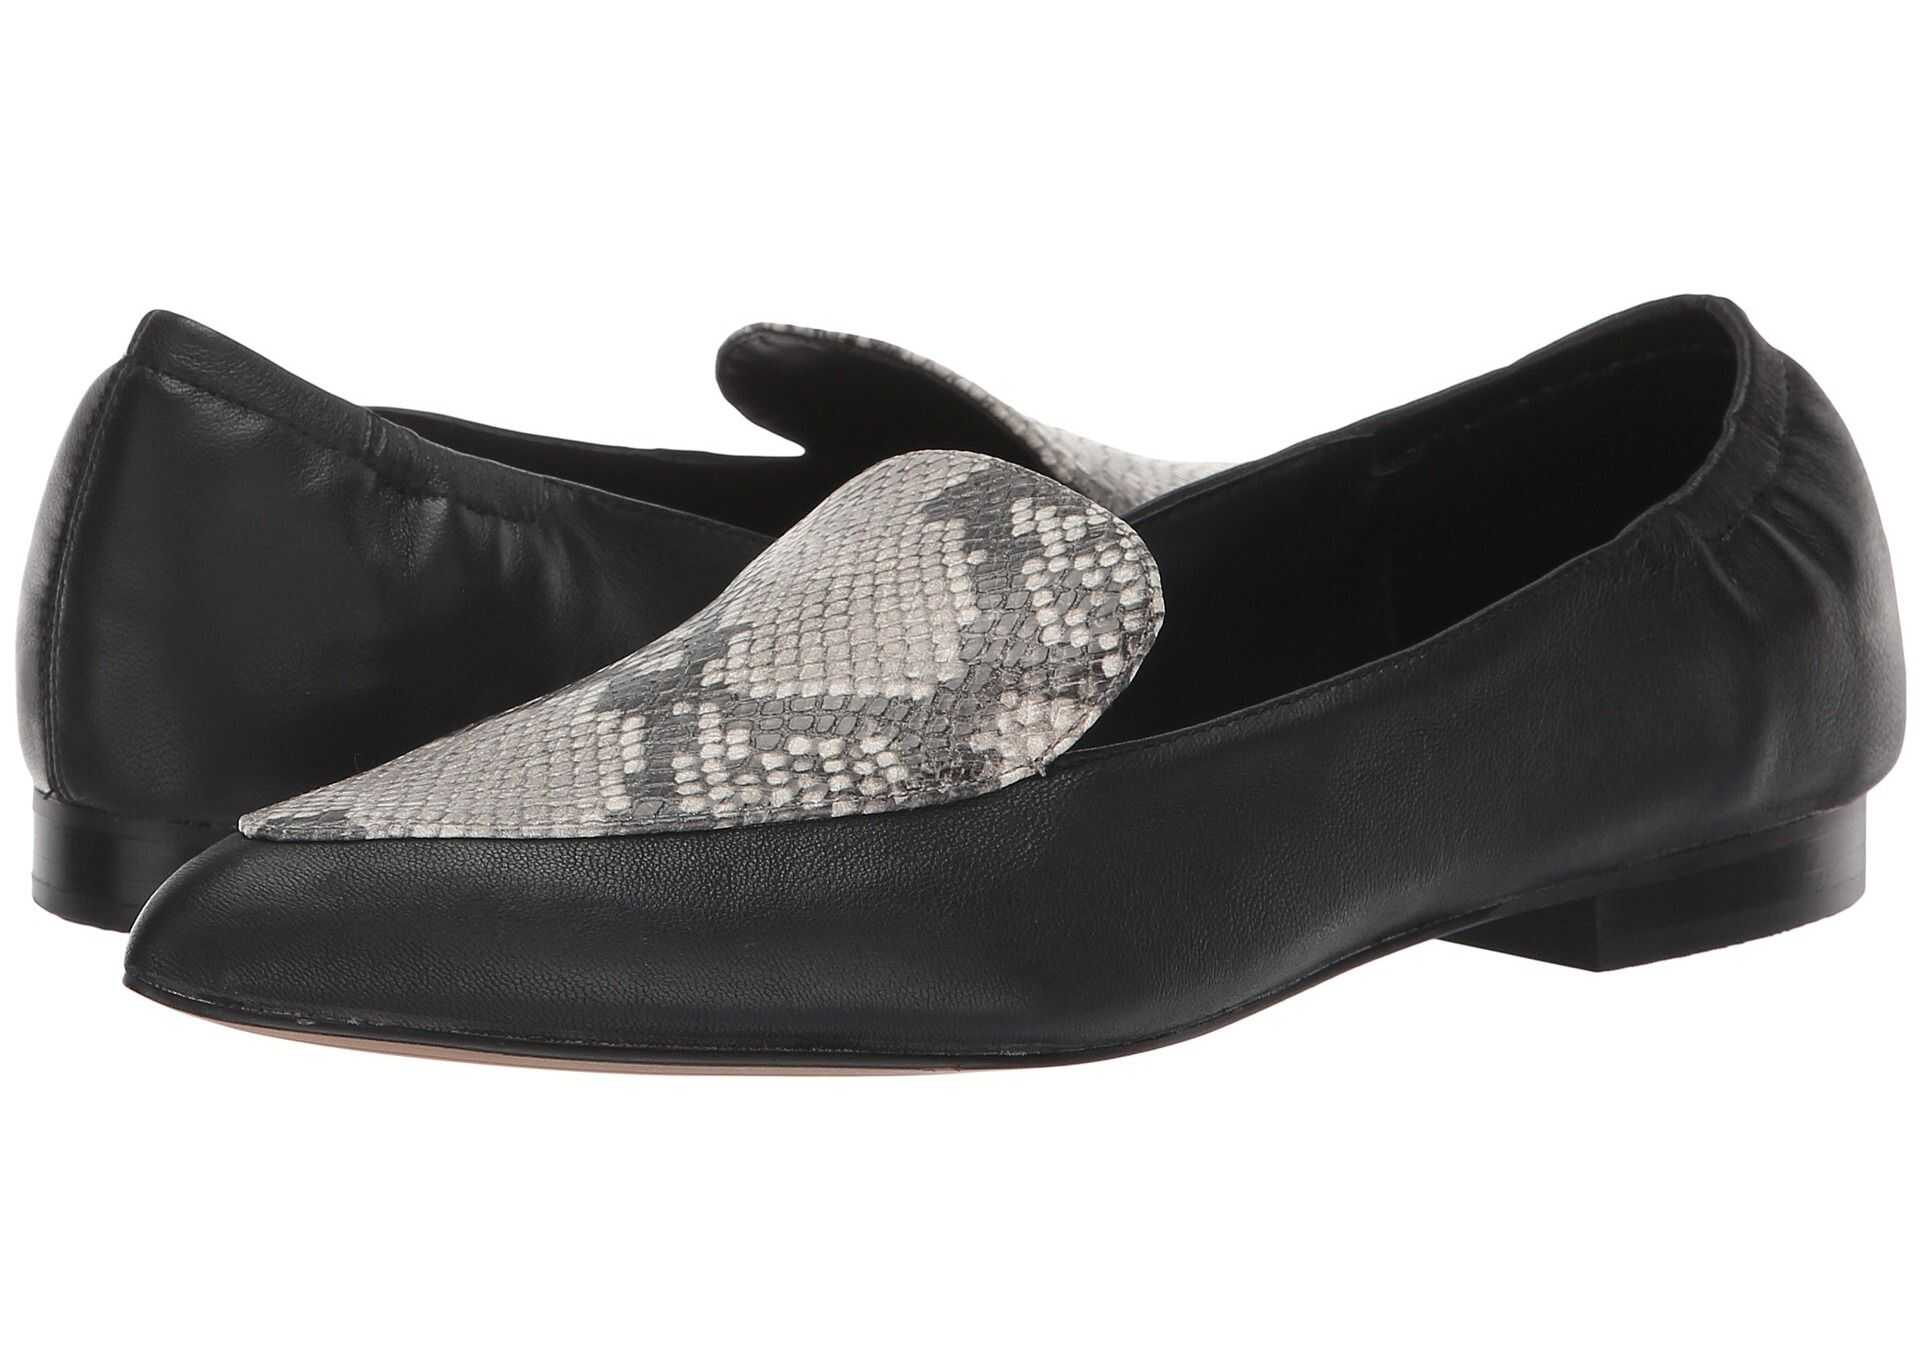 Dolce Vita Wanita Black Leather